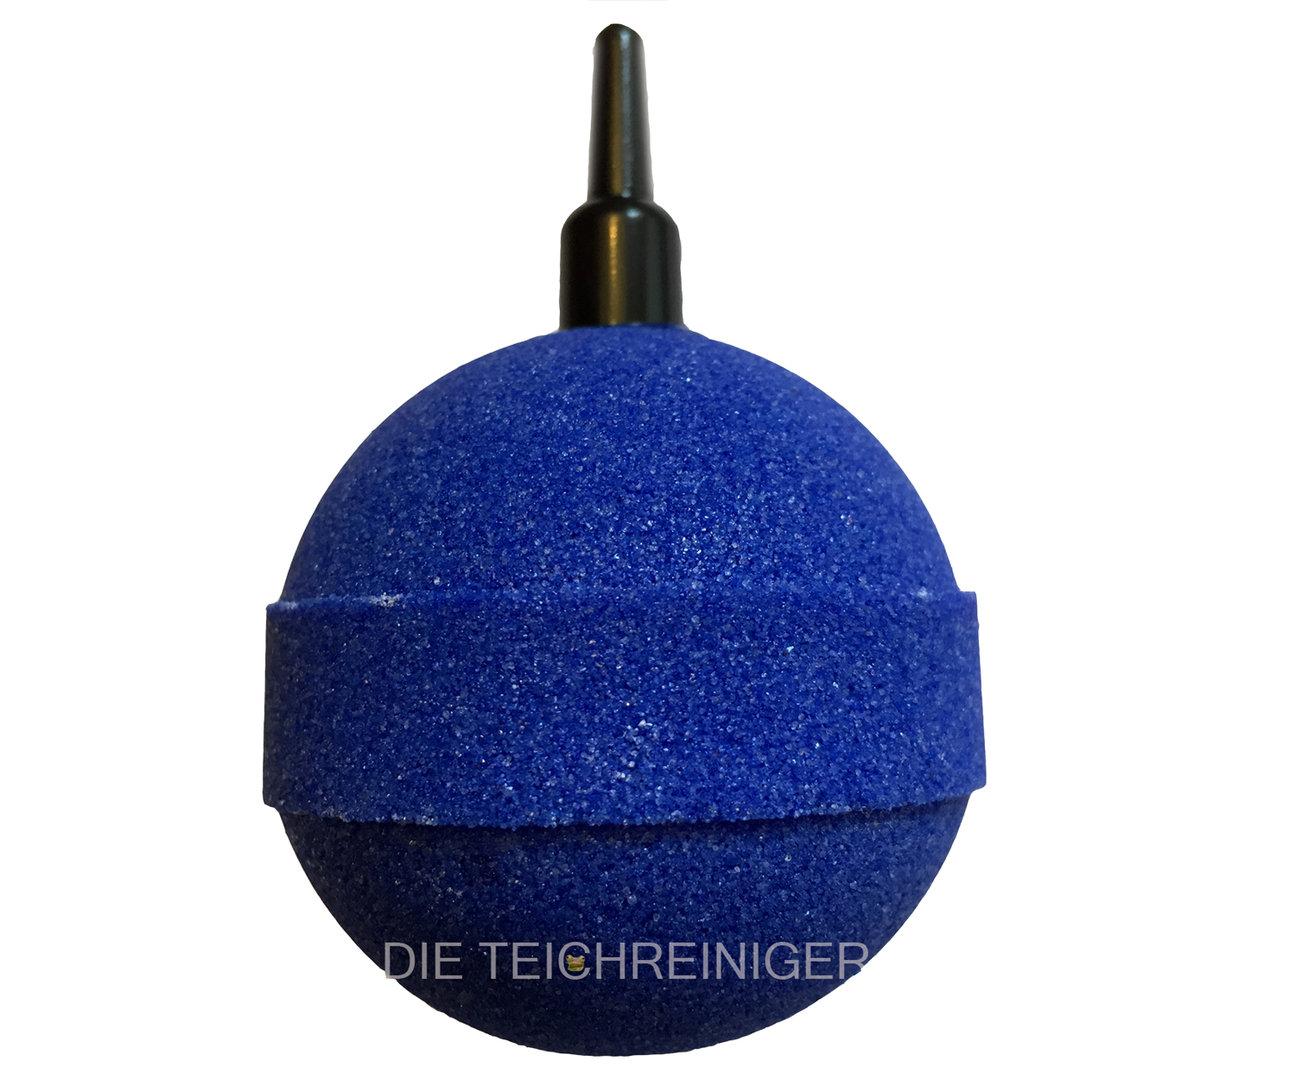 ausstr mer bel fterstein kugel blau 50mm 5 stck f r gartenteiche. Black Bedroom Furniture Sets. Home Design Ideas